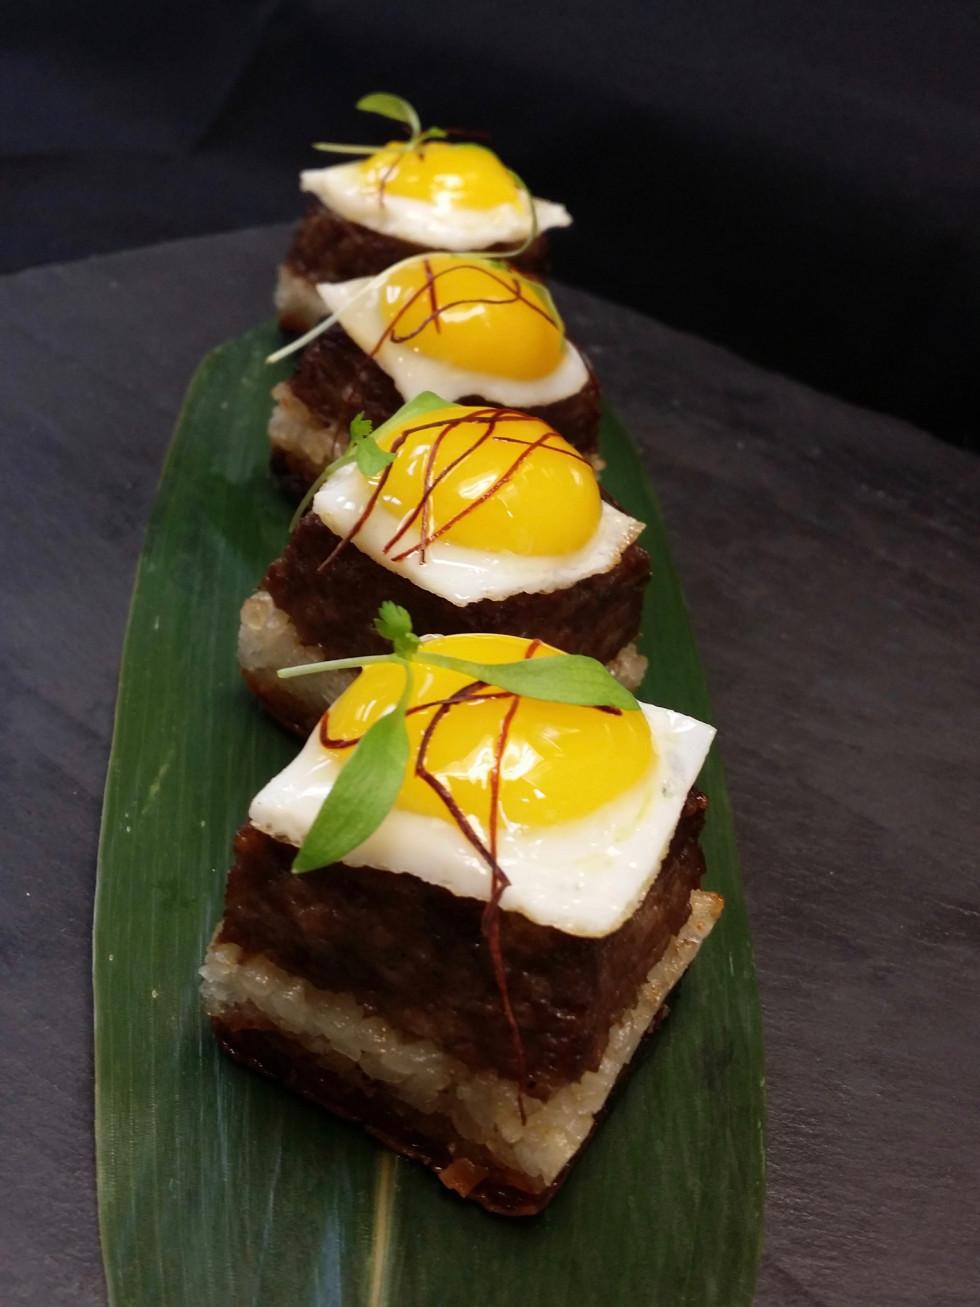 Uptown sushi kobe cubes with quail egg